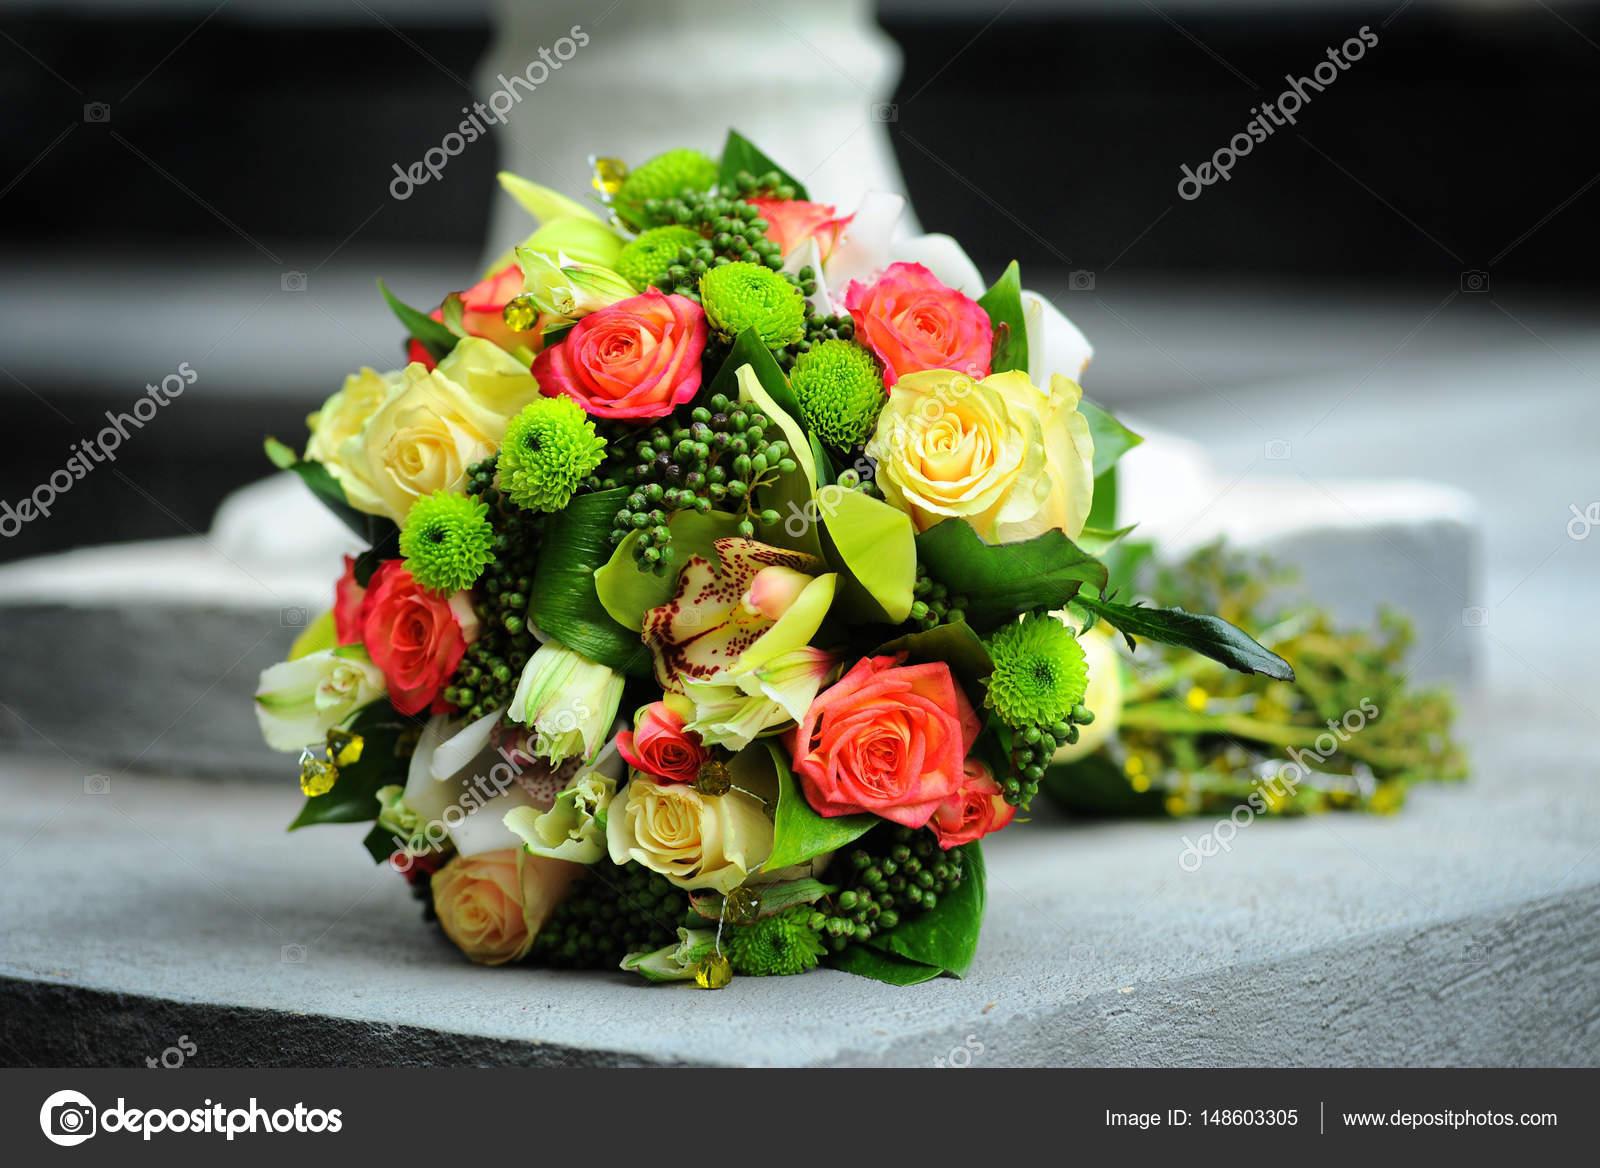 Wedding bouquet of different flowers stock photo white78 148603305 wedding bouquet of different flowers stock photo izmirmasajfo